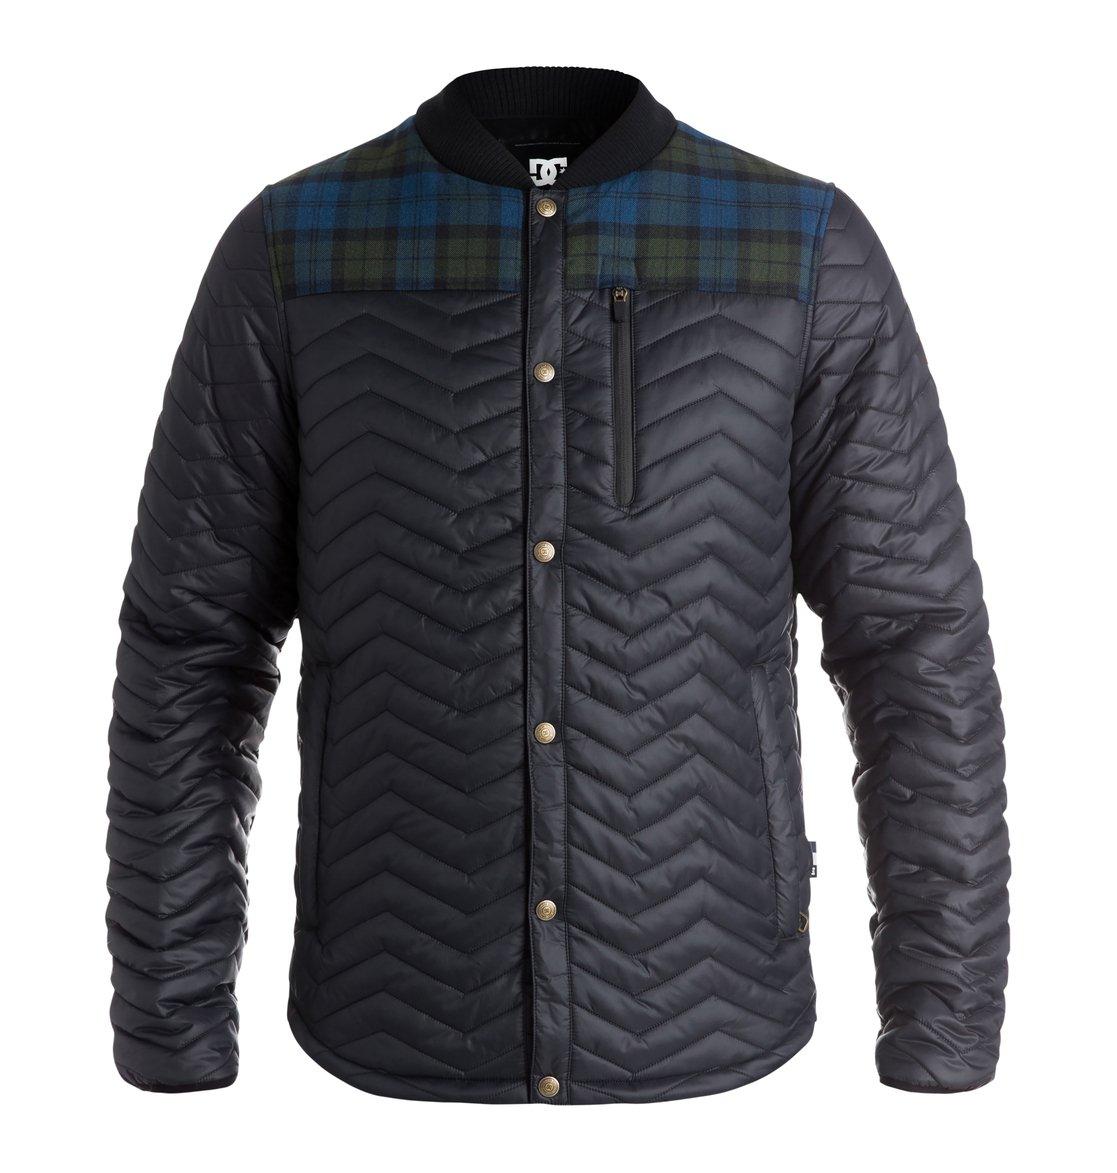 Куртка мужская Convoy tt tf ths 02b hybrid style black ver convoy asia exclusive